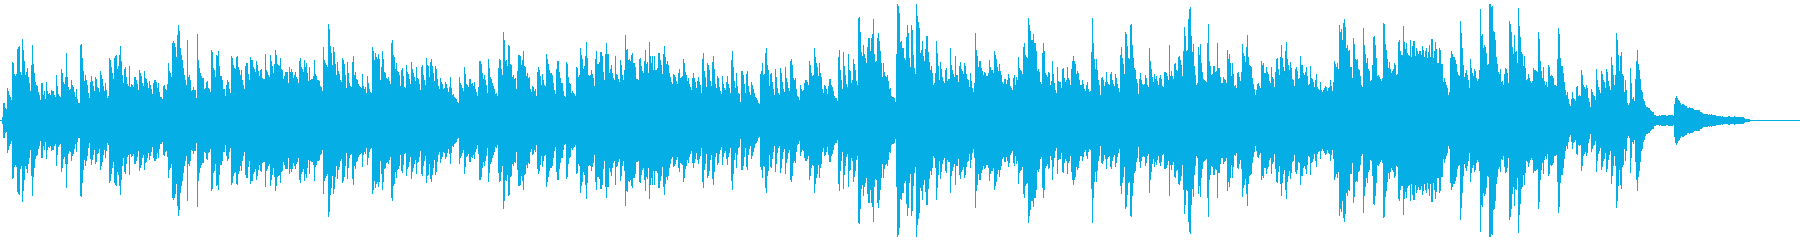 Lovely Adagioの再生済みの波形